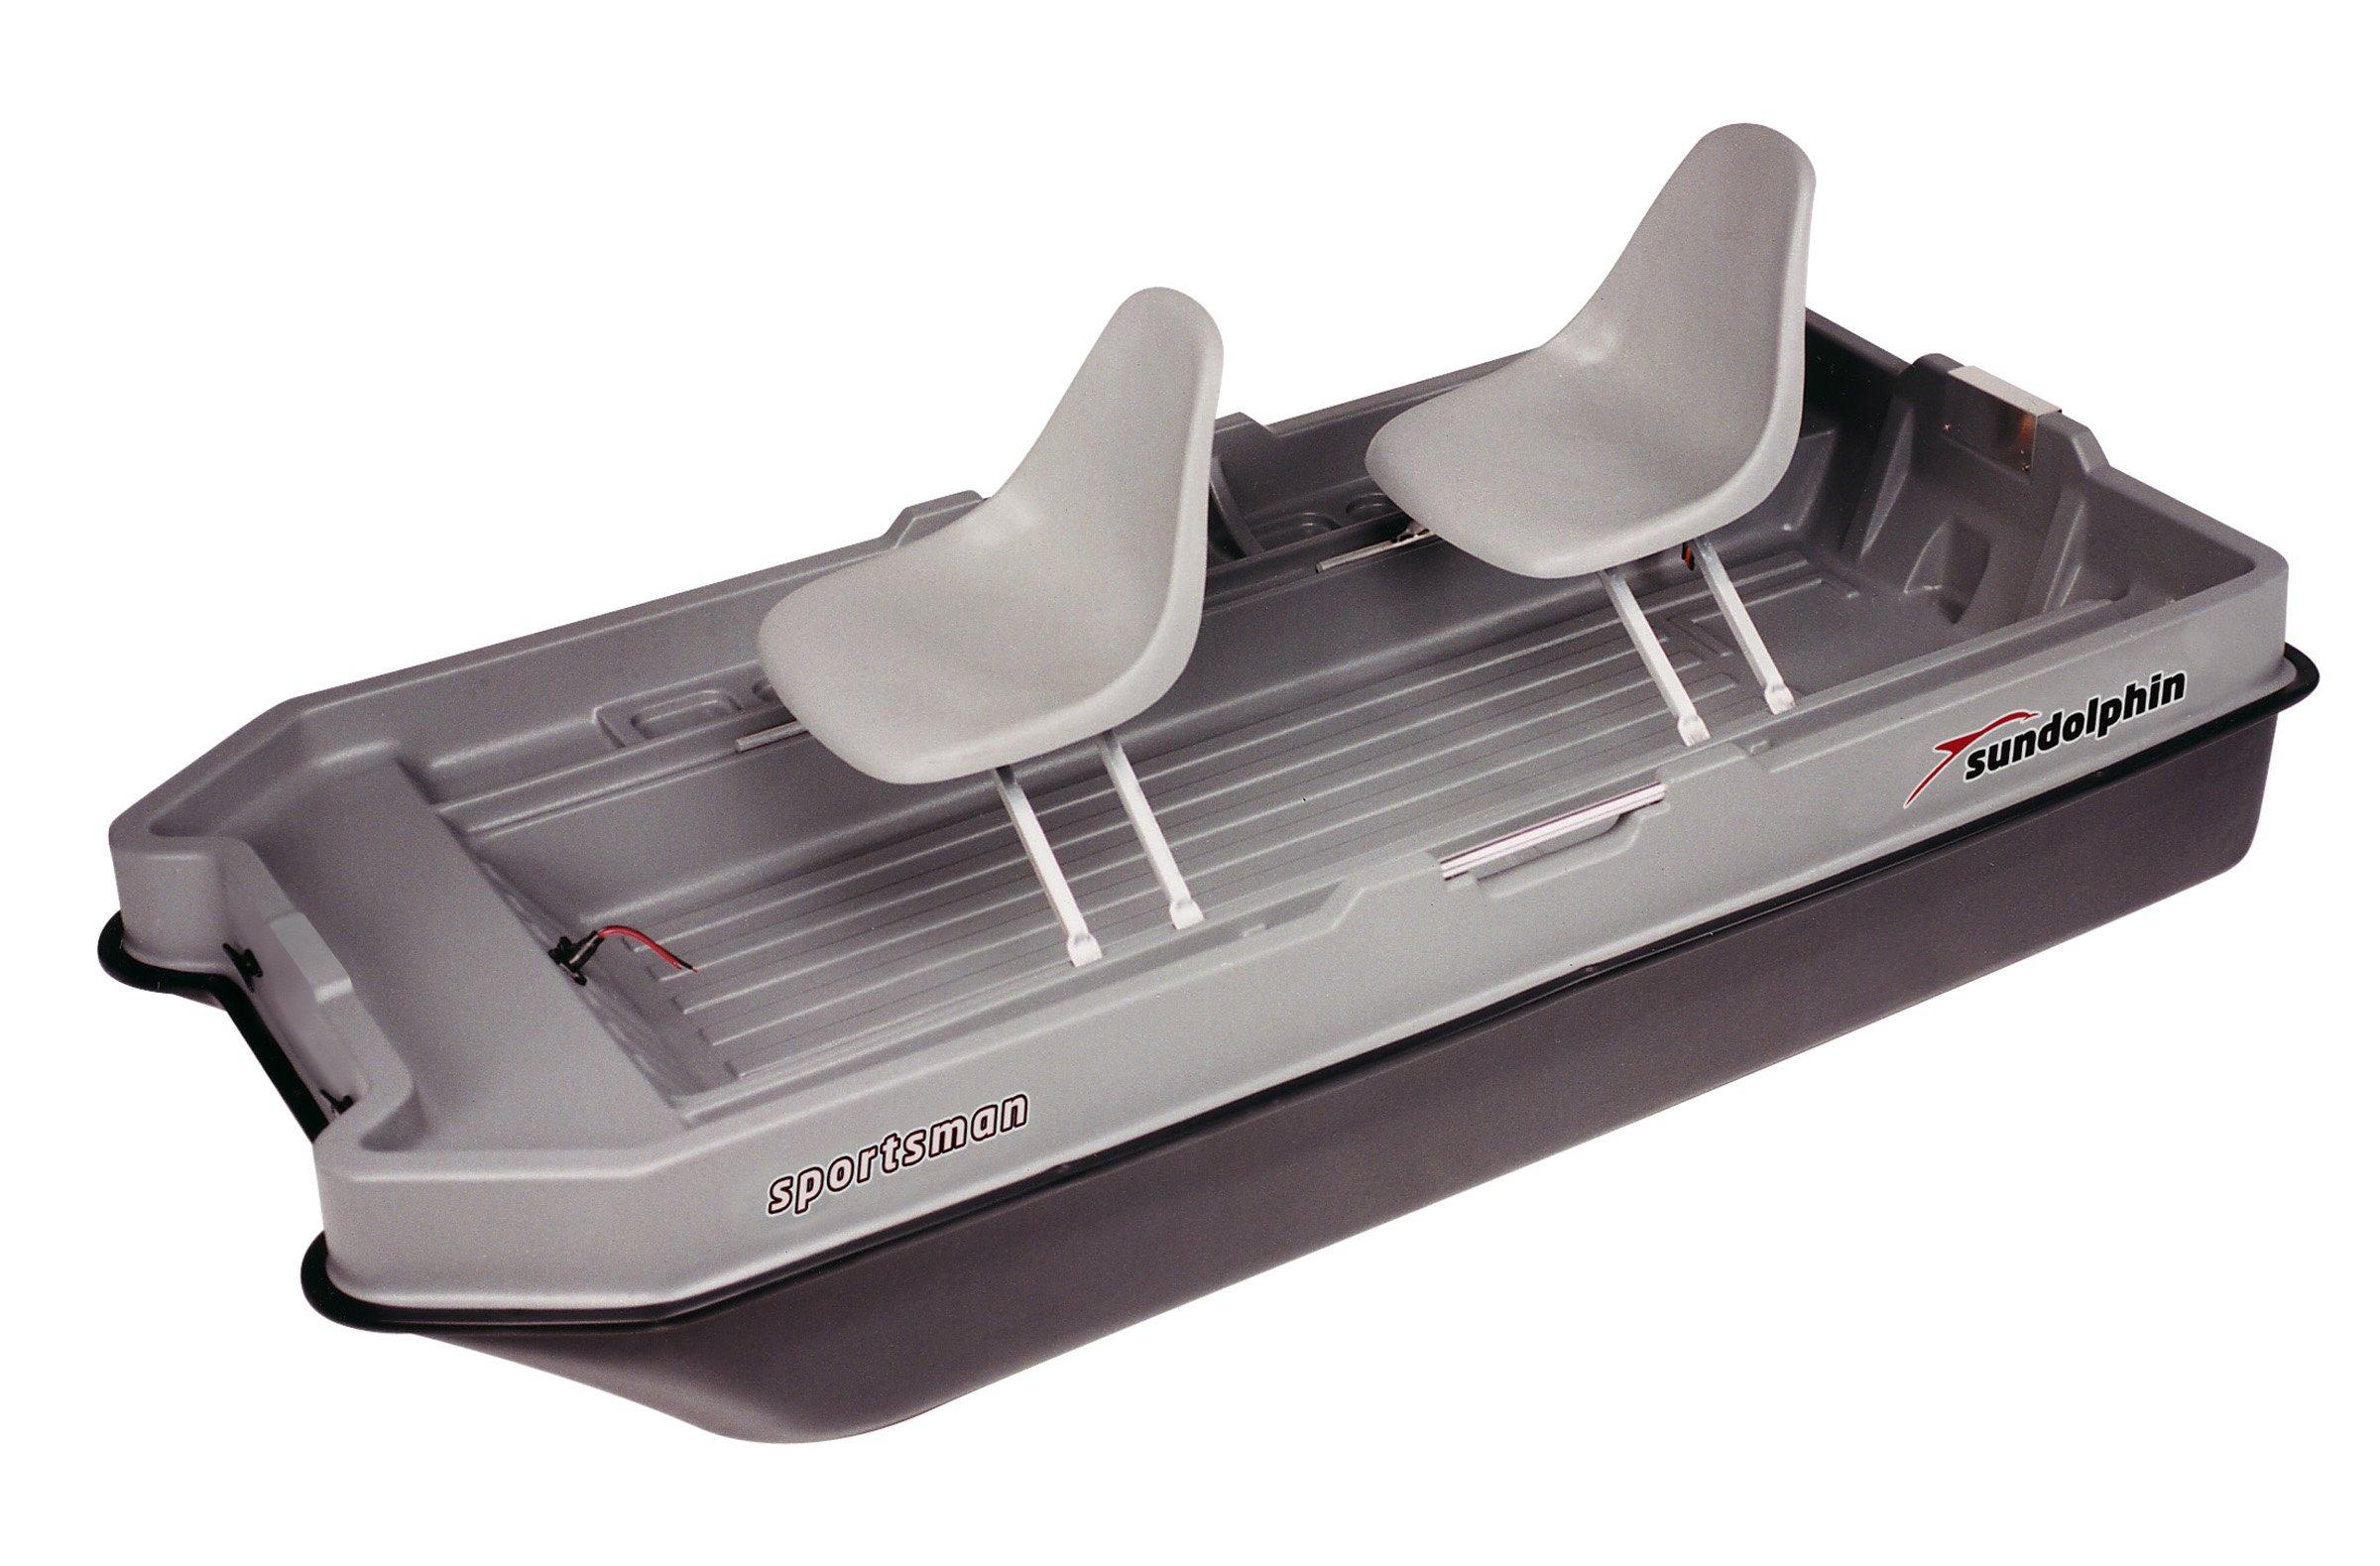 Sun Dolphin Sportsman Fishing Boat (Gray/Black, 8.6-Feet)